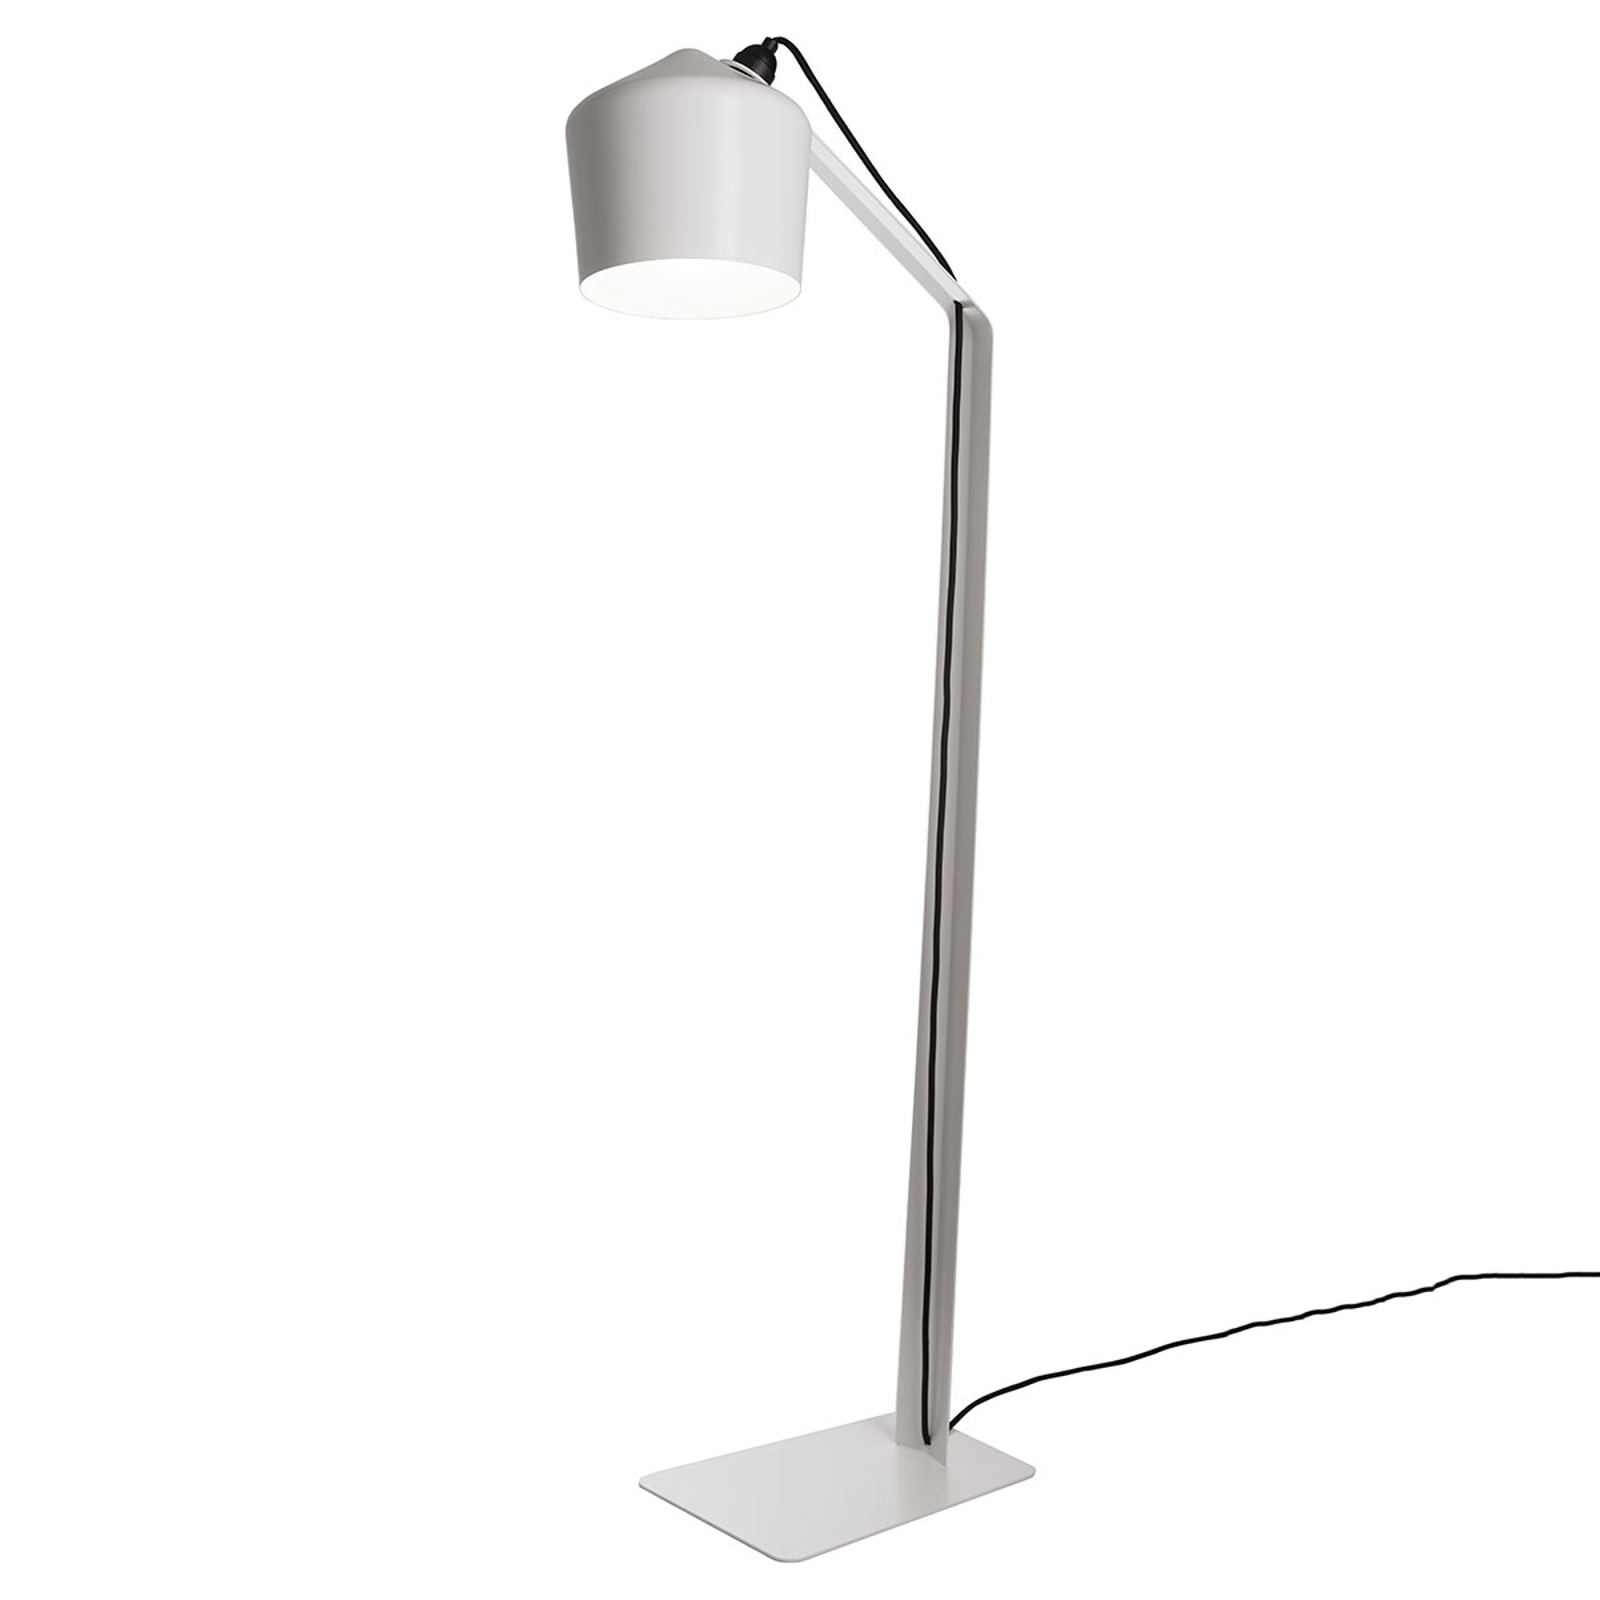 Innolux Pasila designstanderlampe, hvid